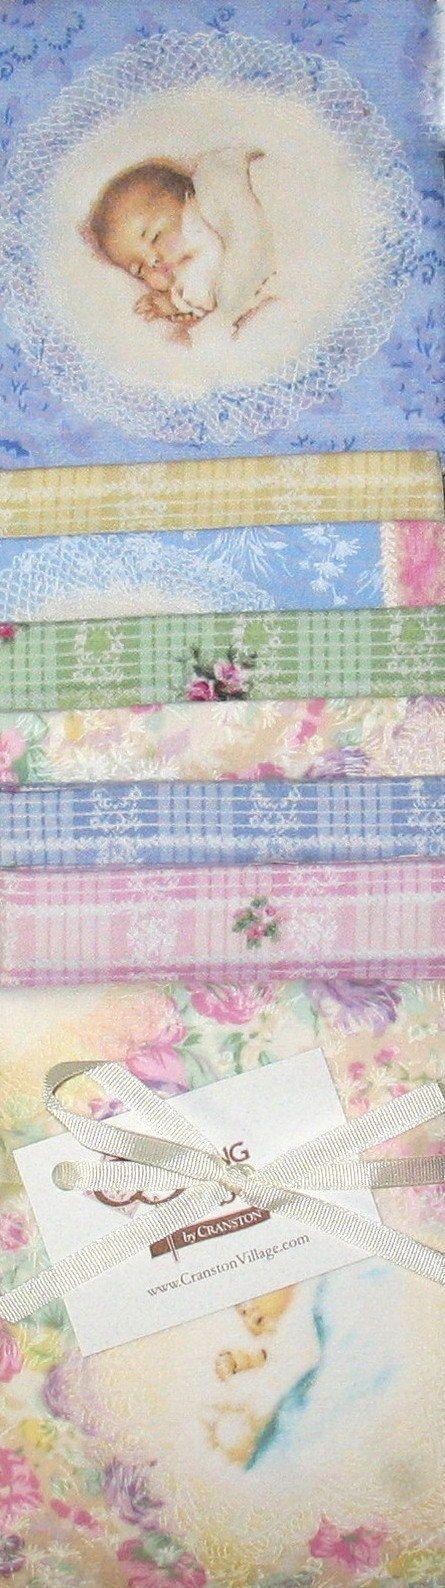 Bessie Pease Gutmann Victorian Fabric Baby Nursery by NsewFabrics, $19.99